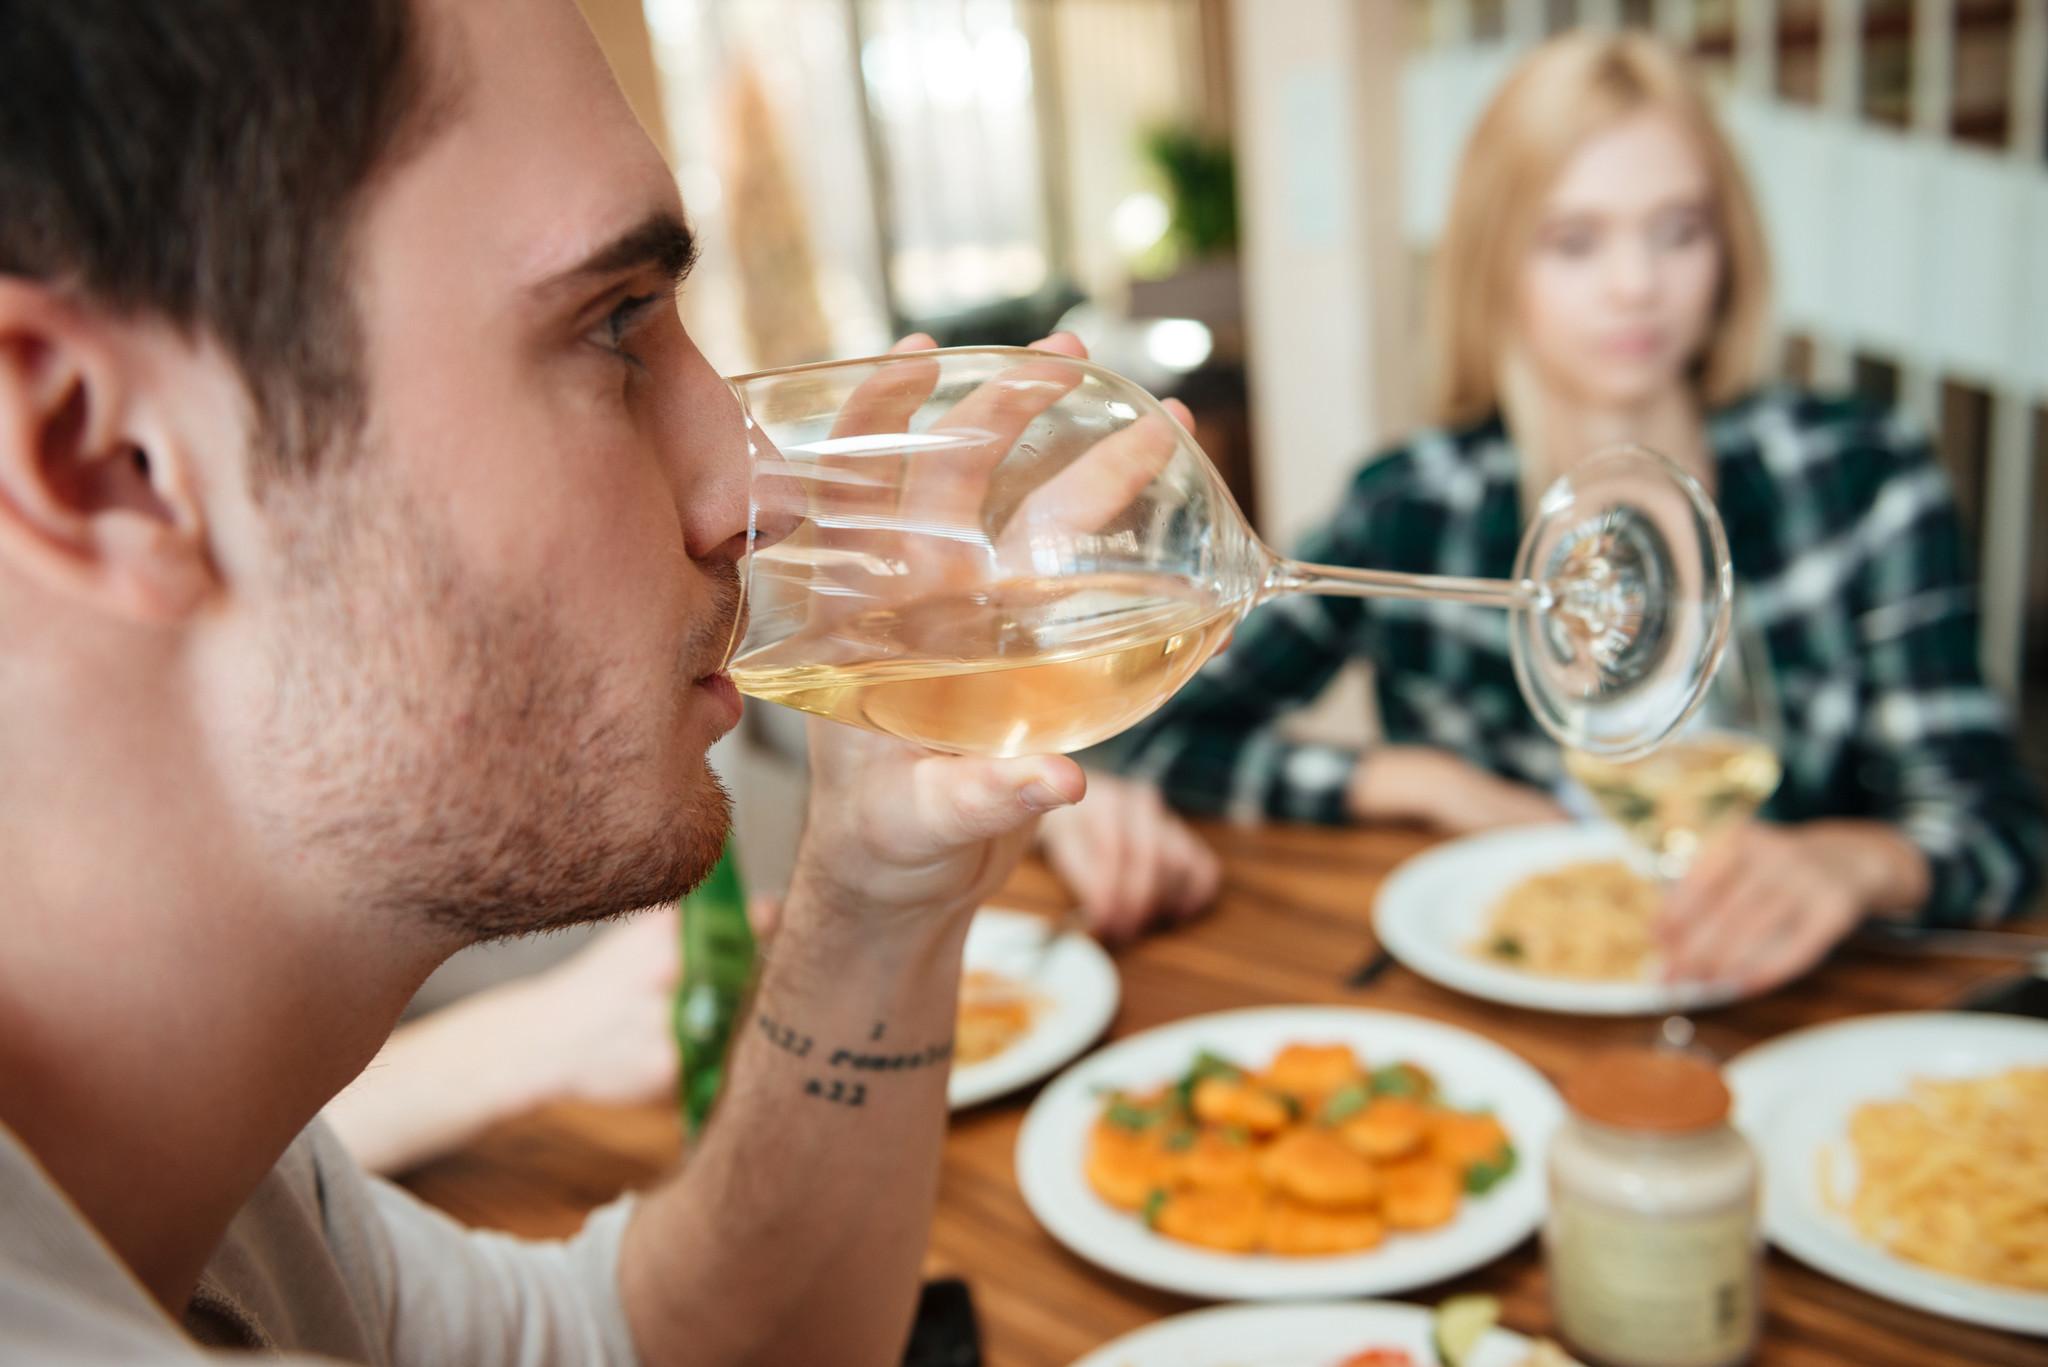 Hide Your Wine Studies Show Seeing Parents Drink Upsets